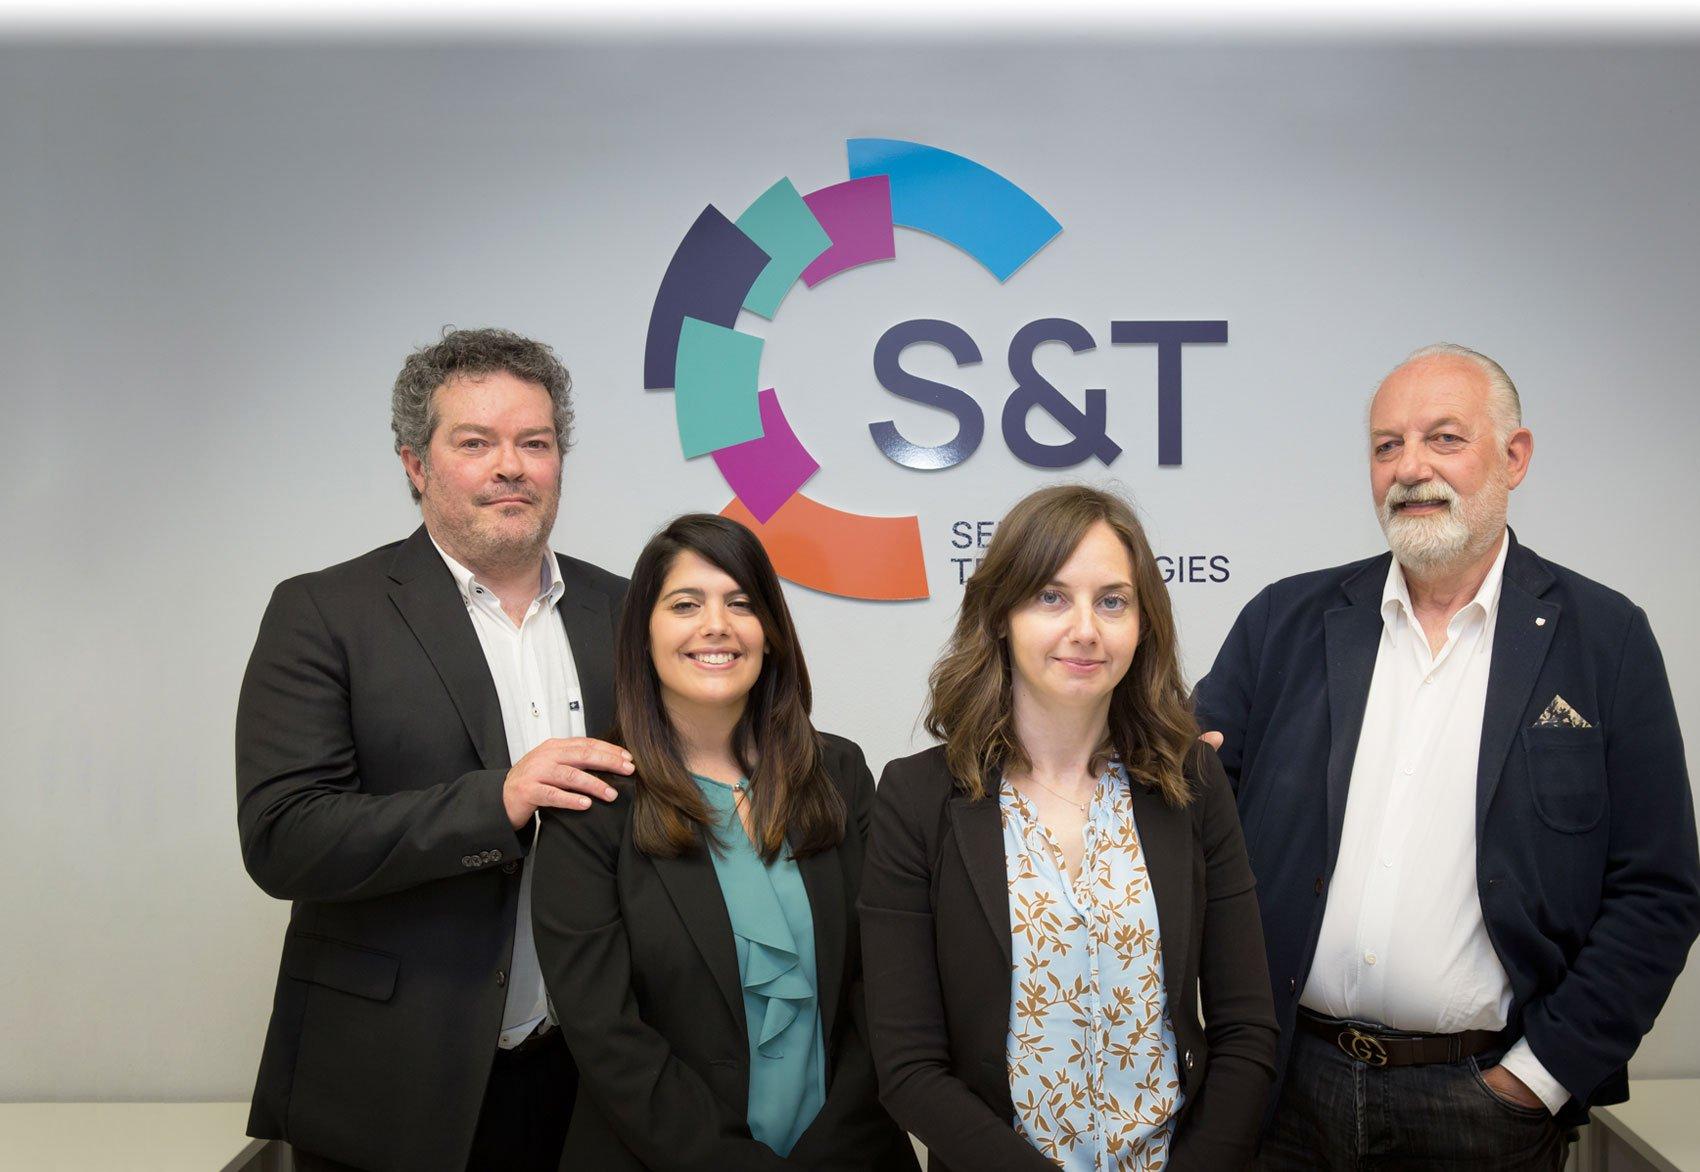 https://st-srl.eu/wp-content/uploads/2021/07/ST-Service-Technologies-SRL-Team.jpg